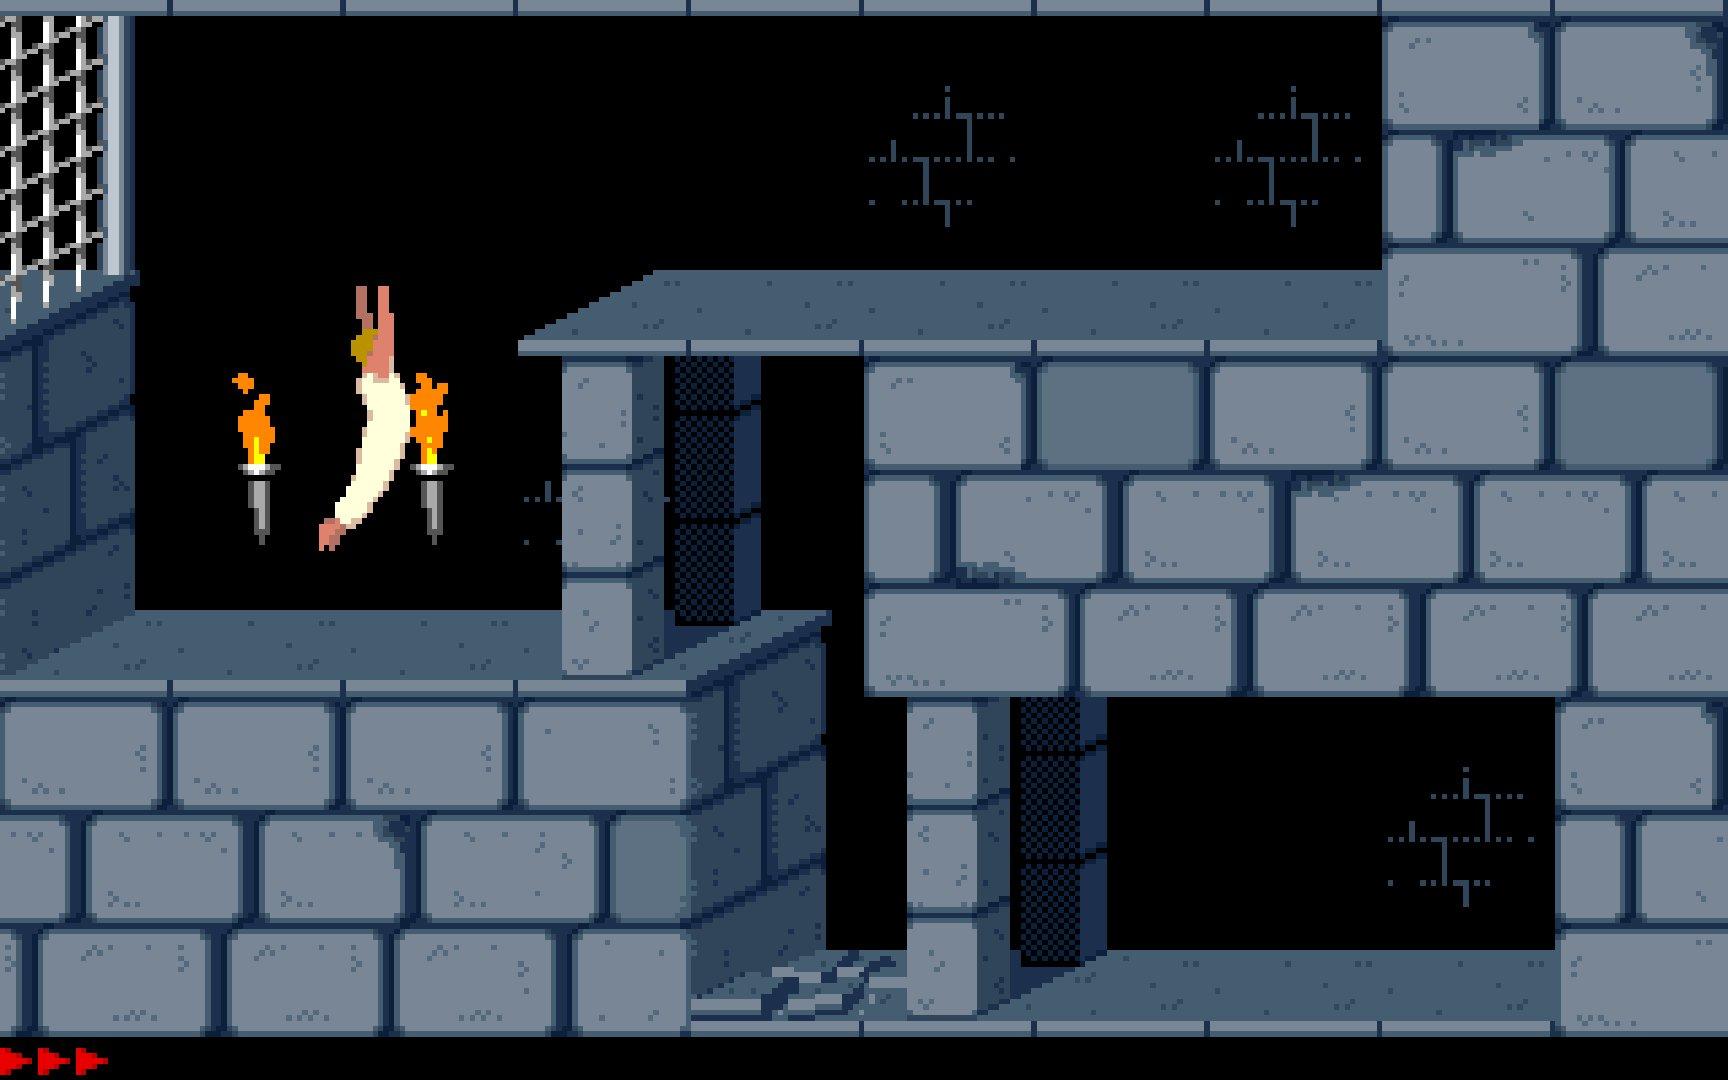 Prince of Persia DOS 2